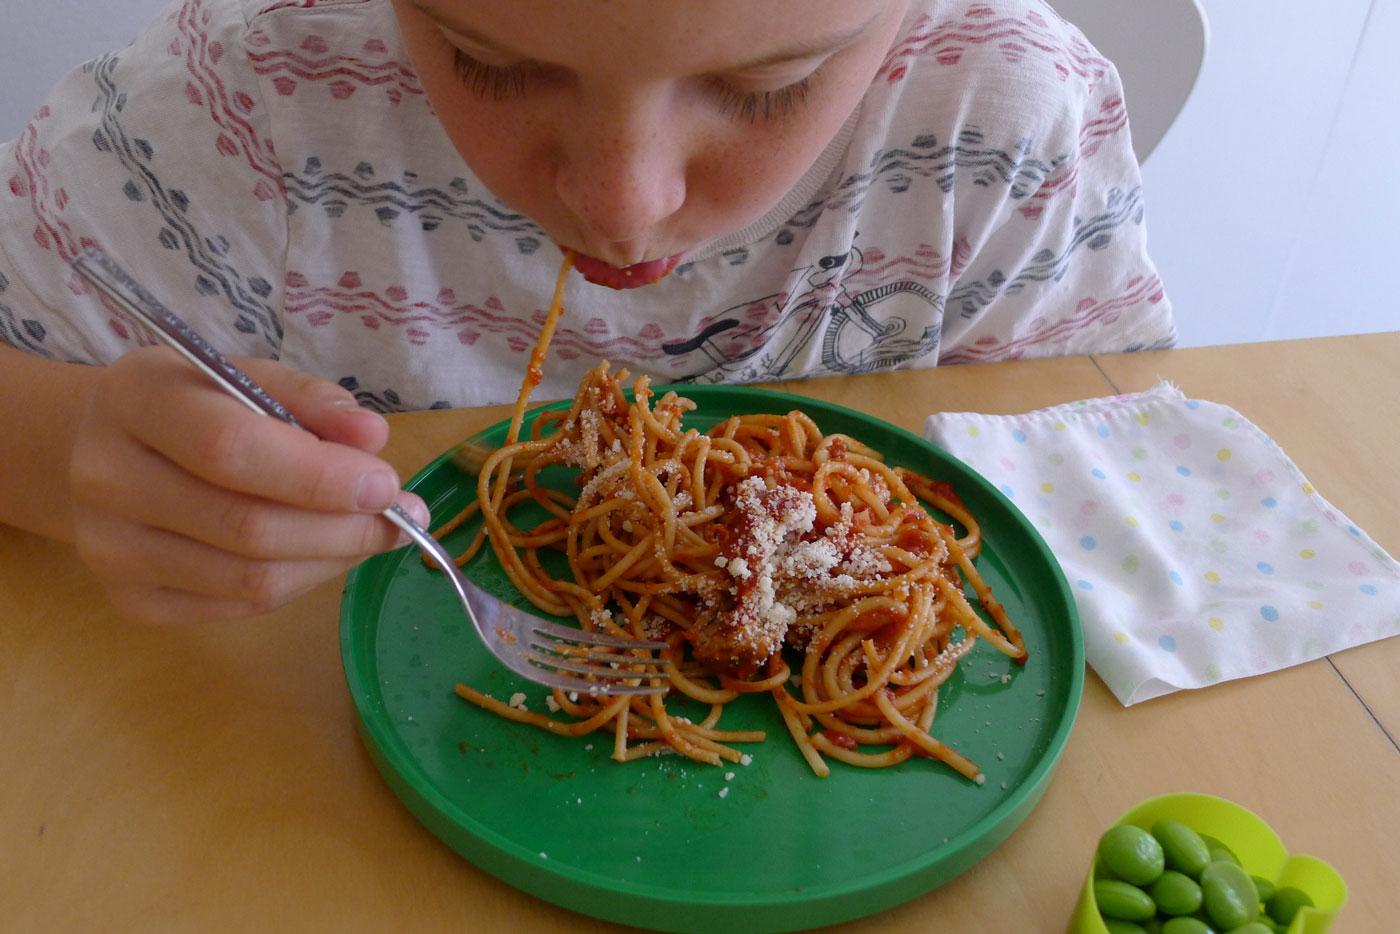 Iain digging into his spaghetti lunch